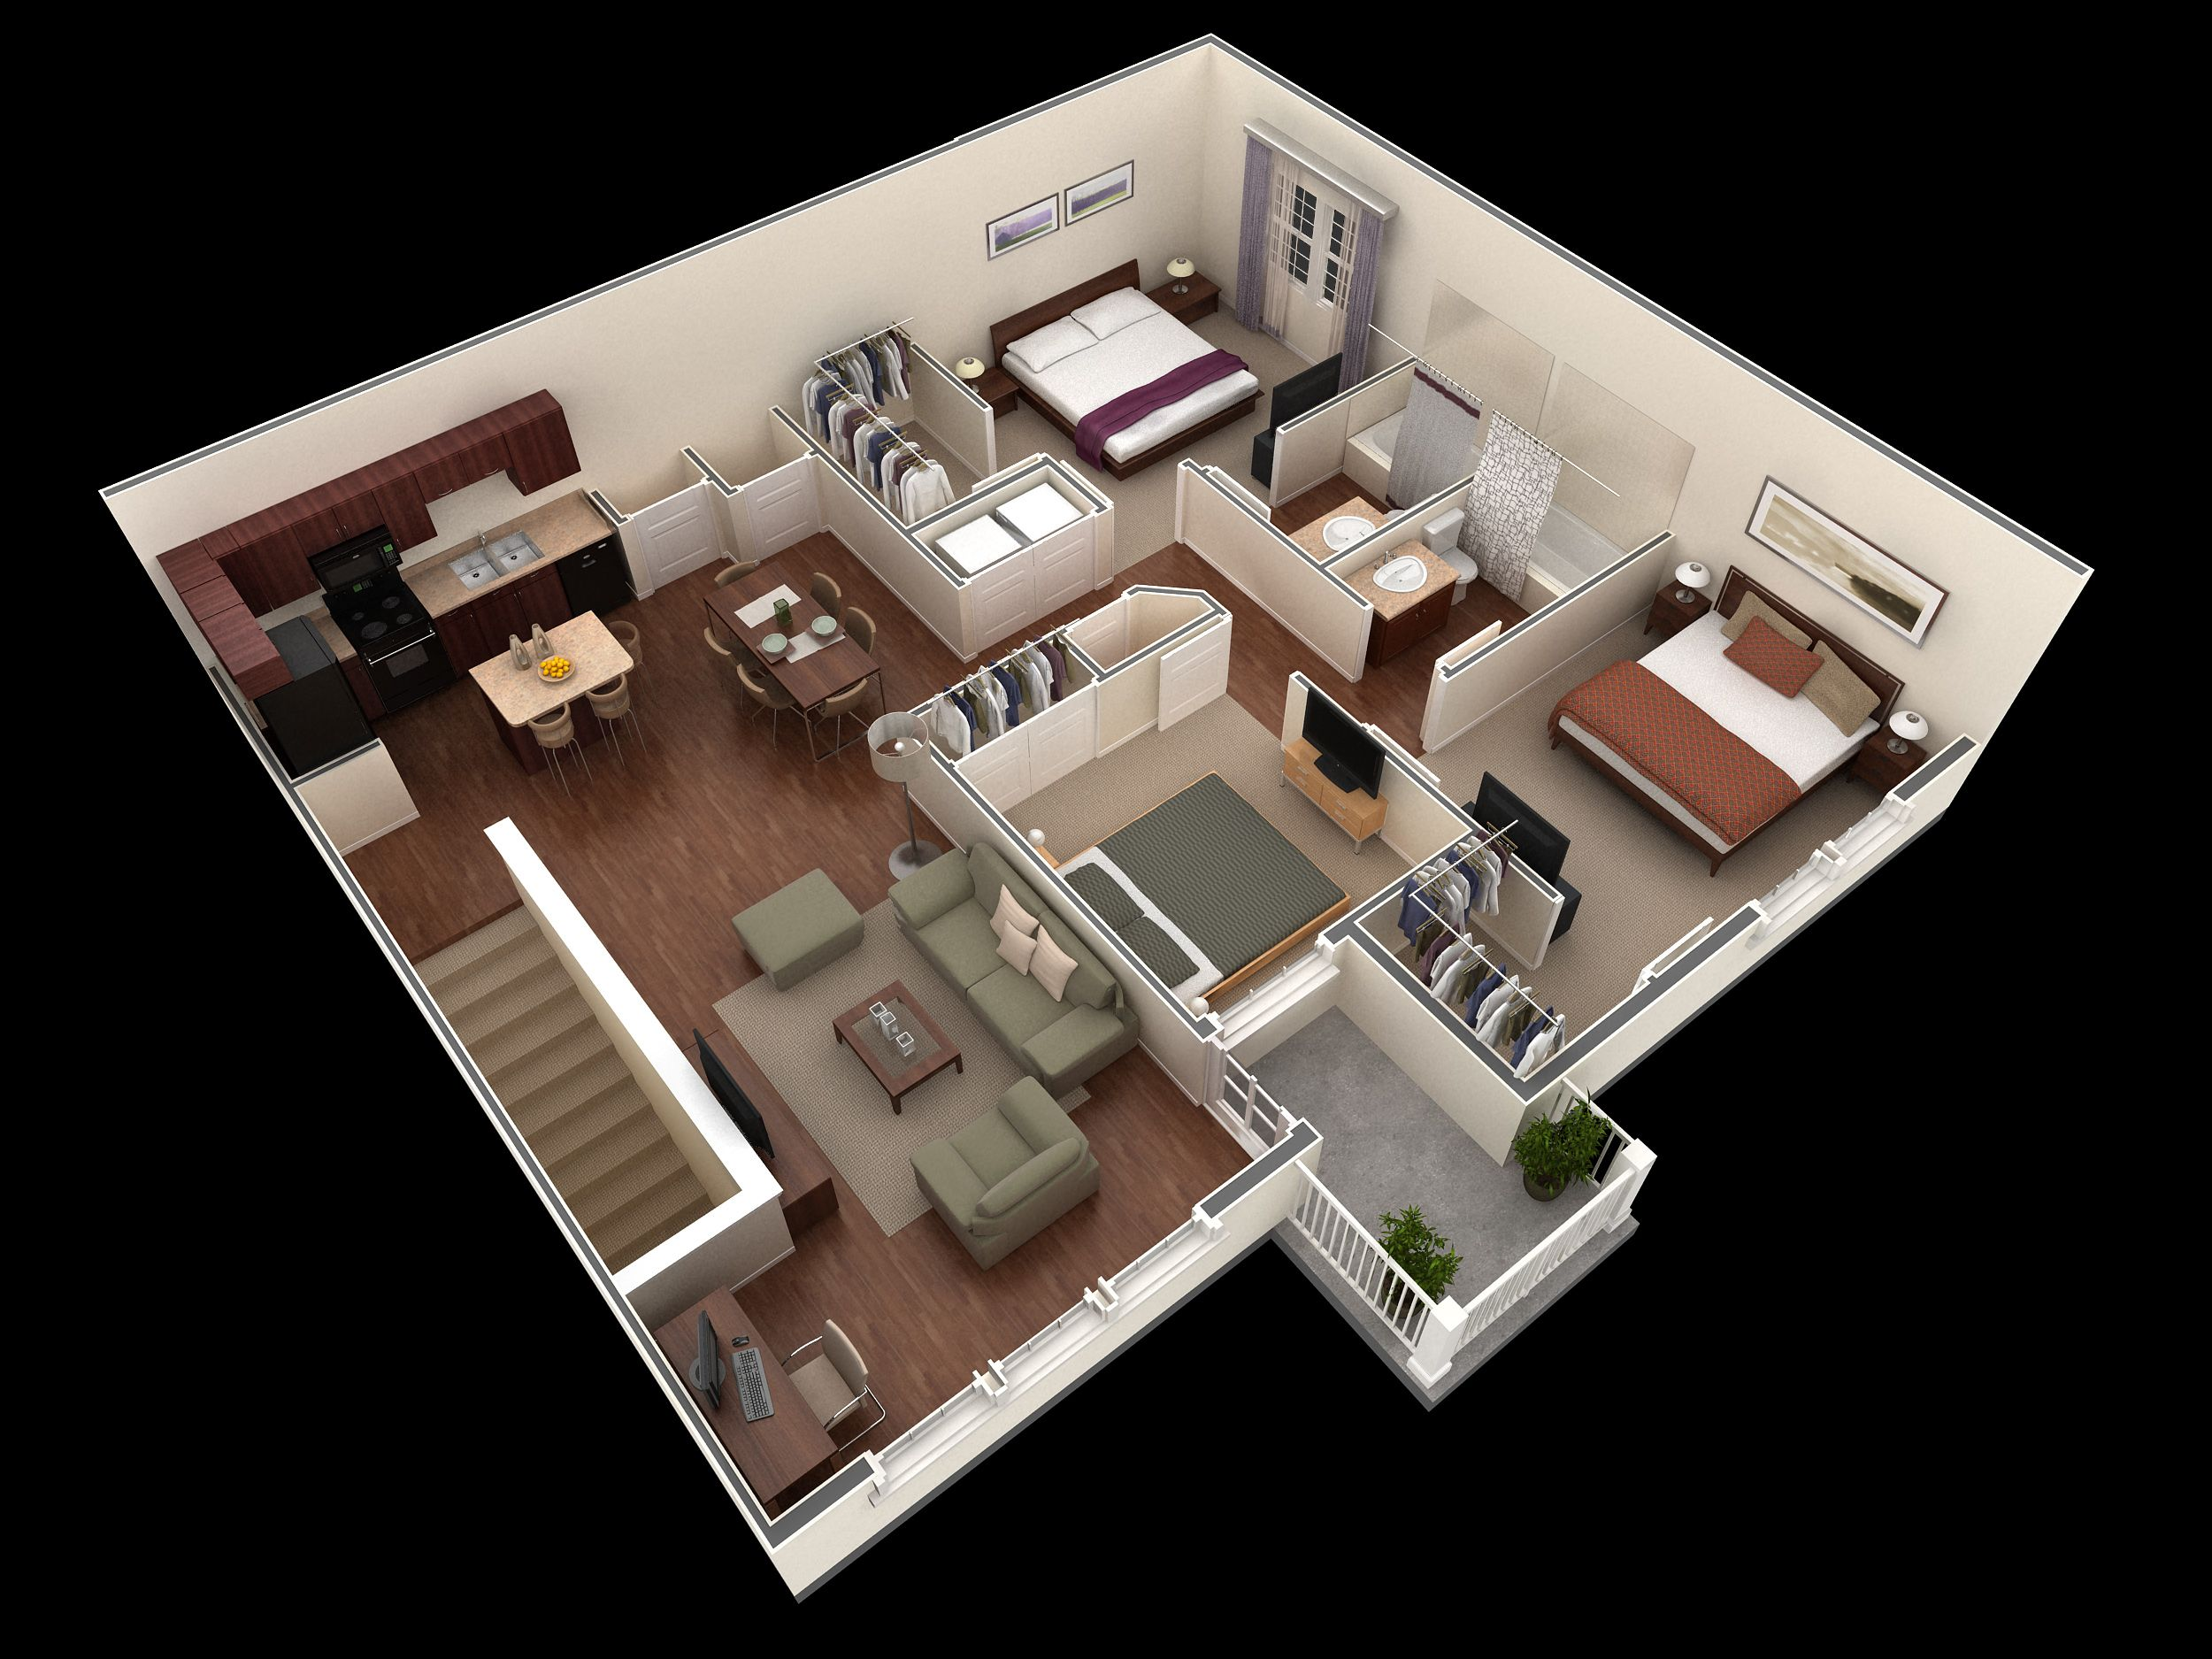 3 Bedroom 2 Bath 1378 Sf Apartment At Springs At Legacy Commons Apartments In Omaha Ne The Diseno Casas